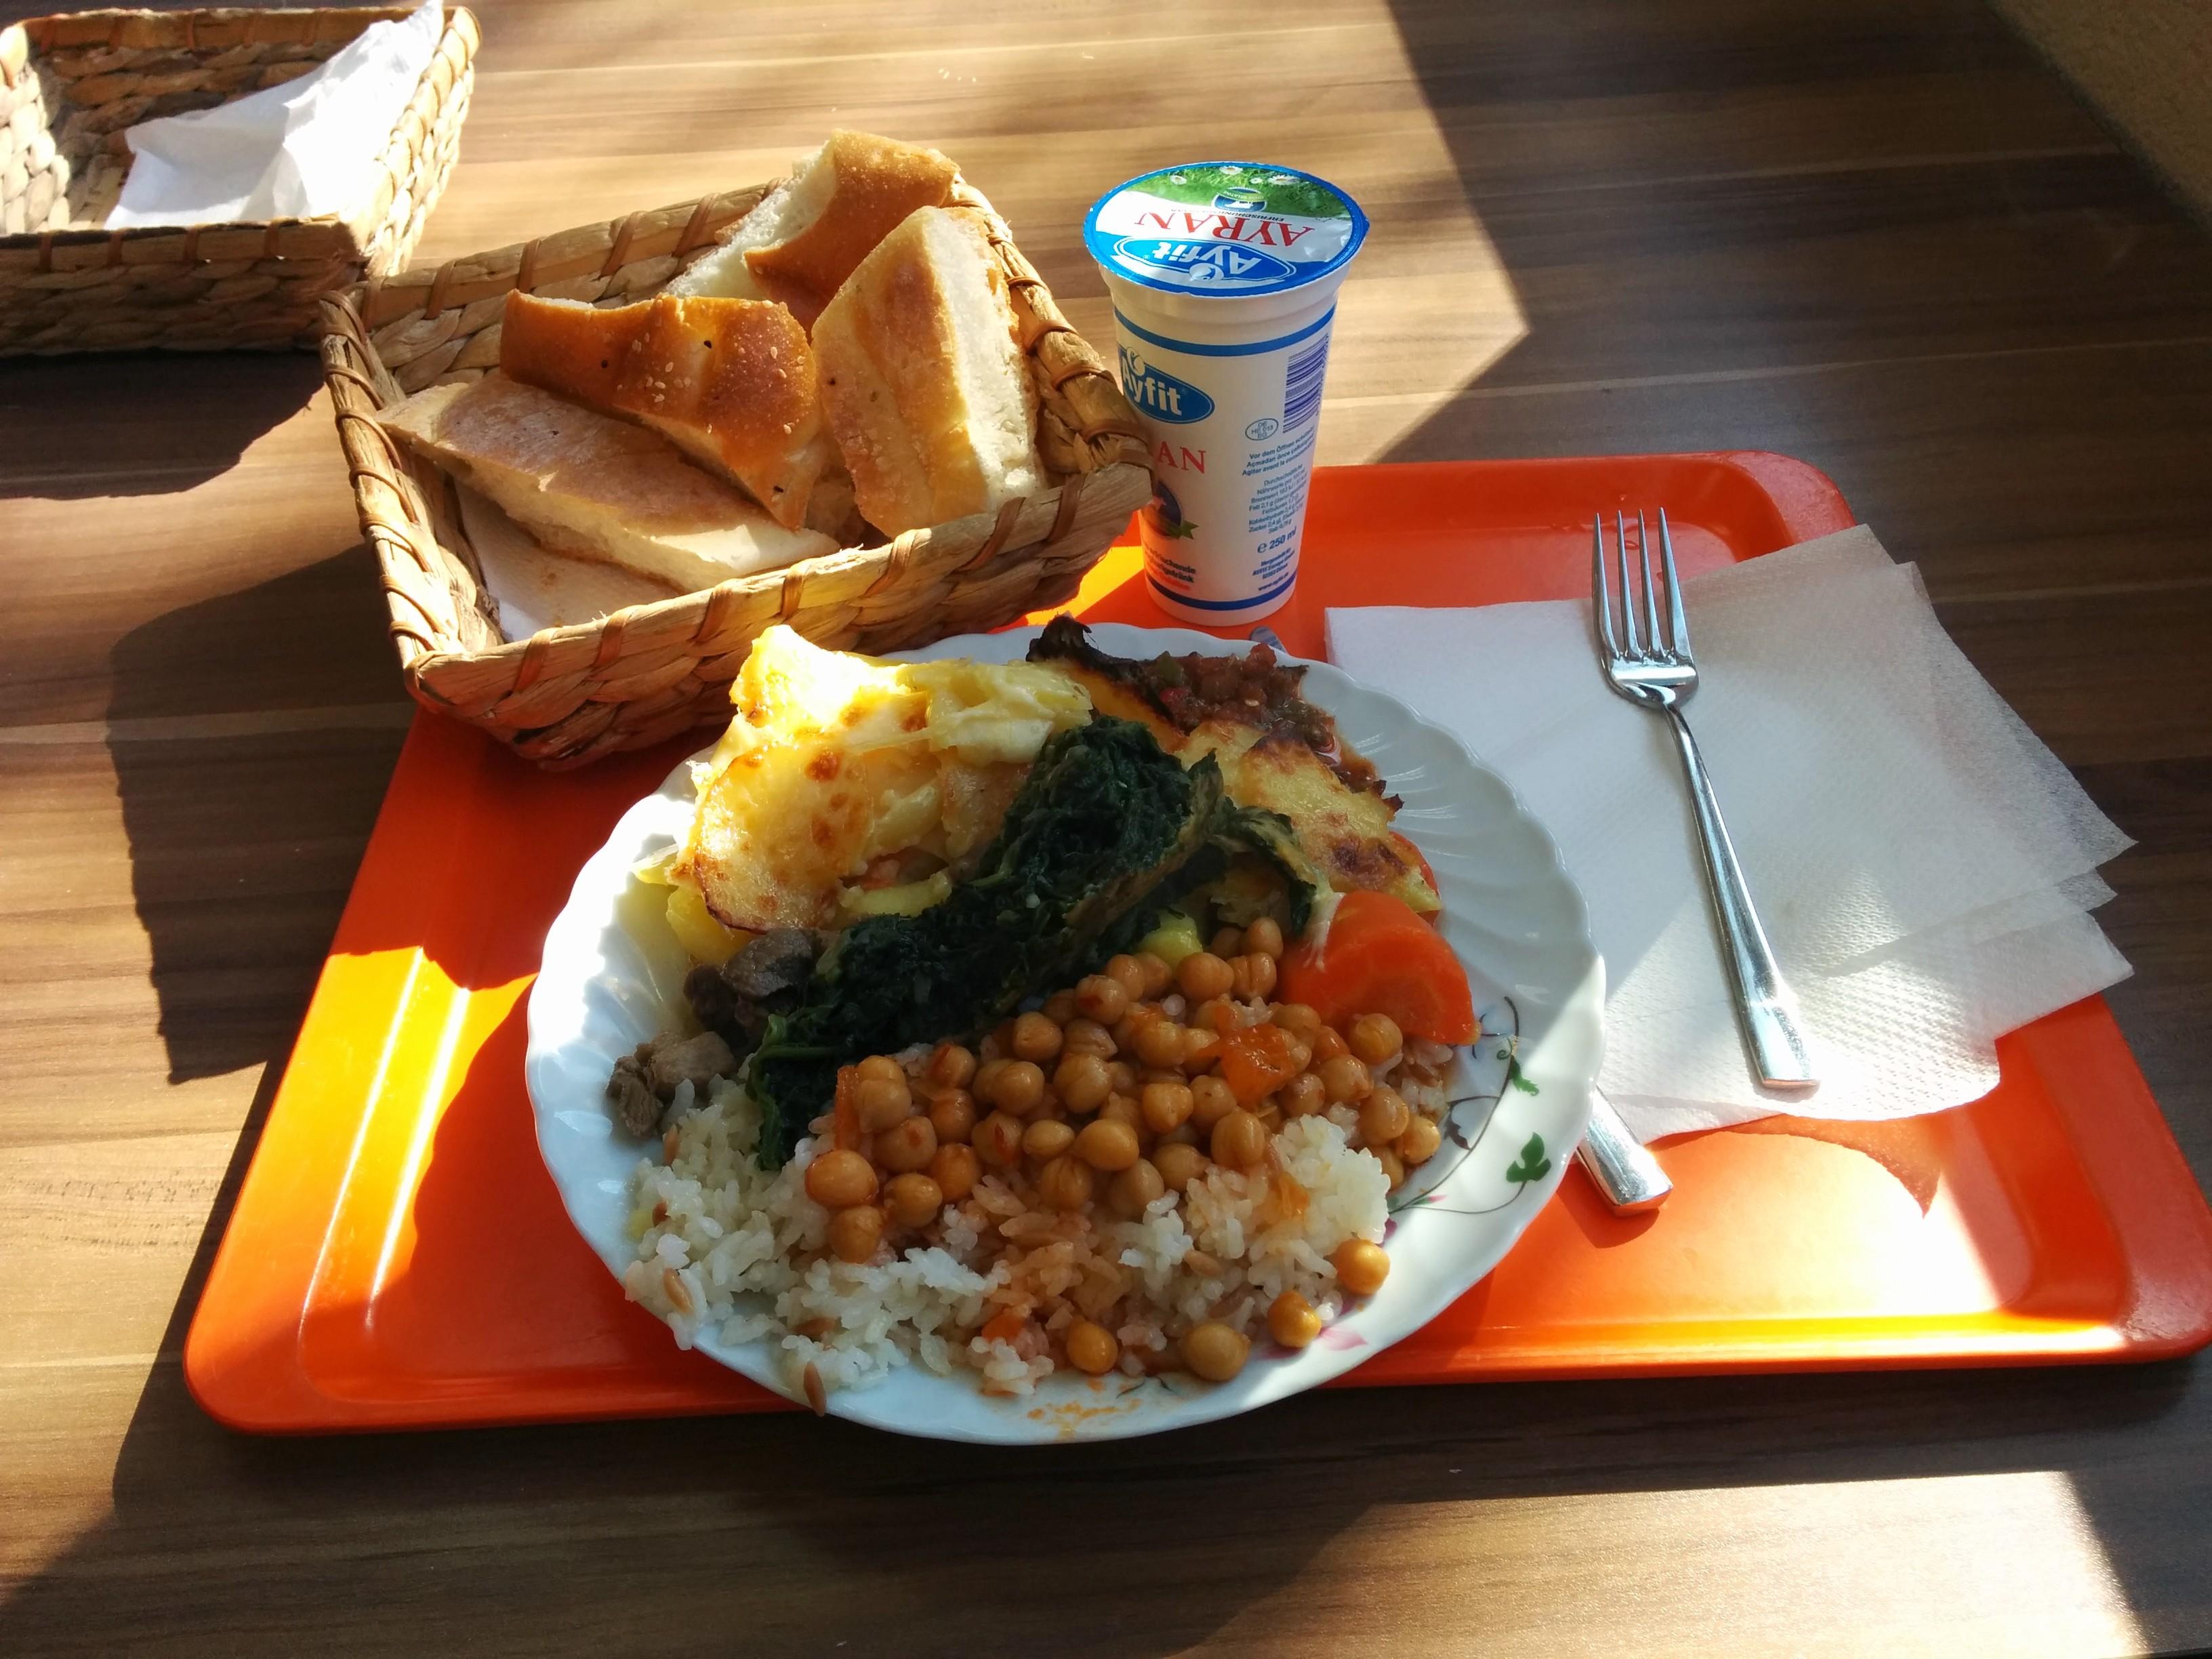 https://foodloader.net/nico_2015-03-09_reis-rindfleisch-kartoffeln-spinat-kichererbsen-brot.jpg